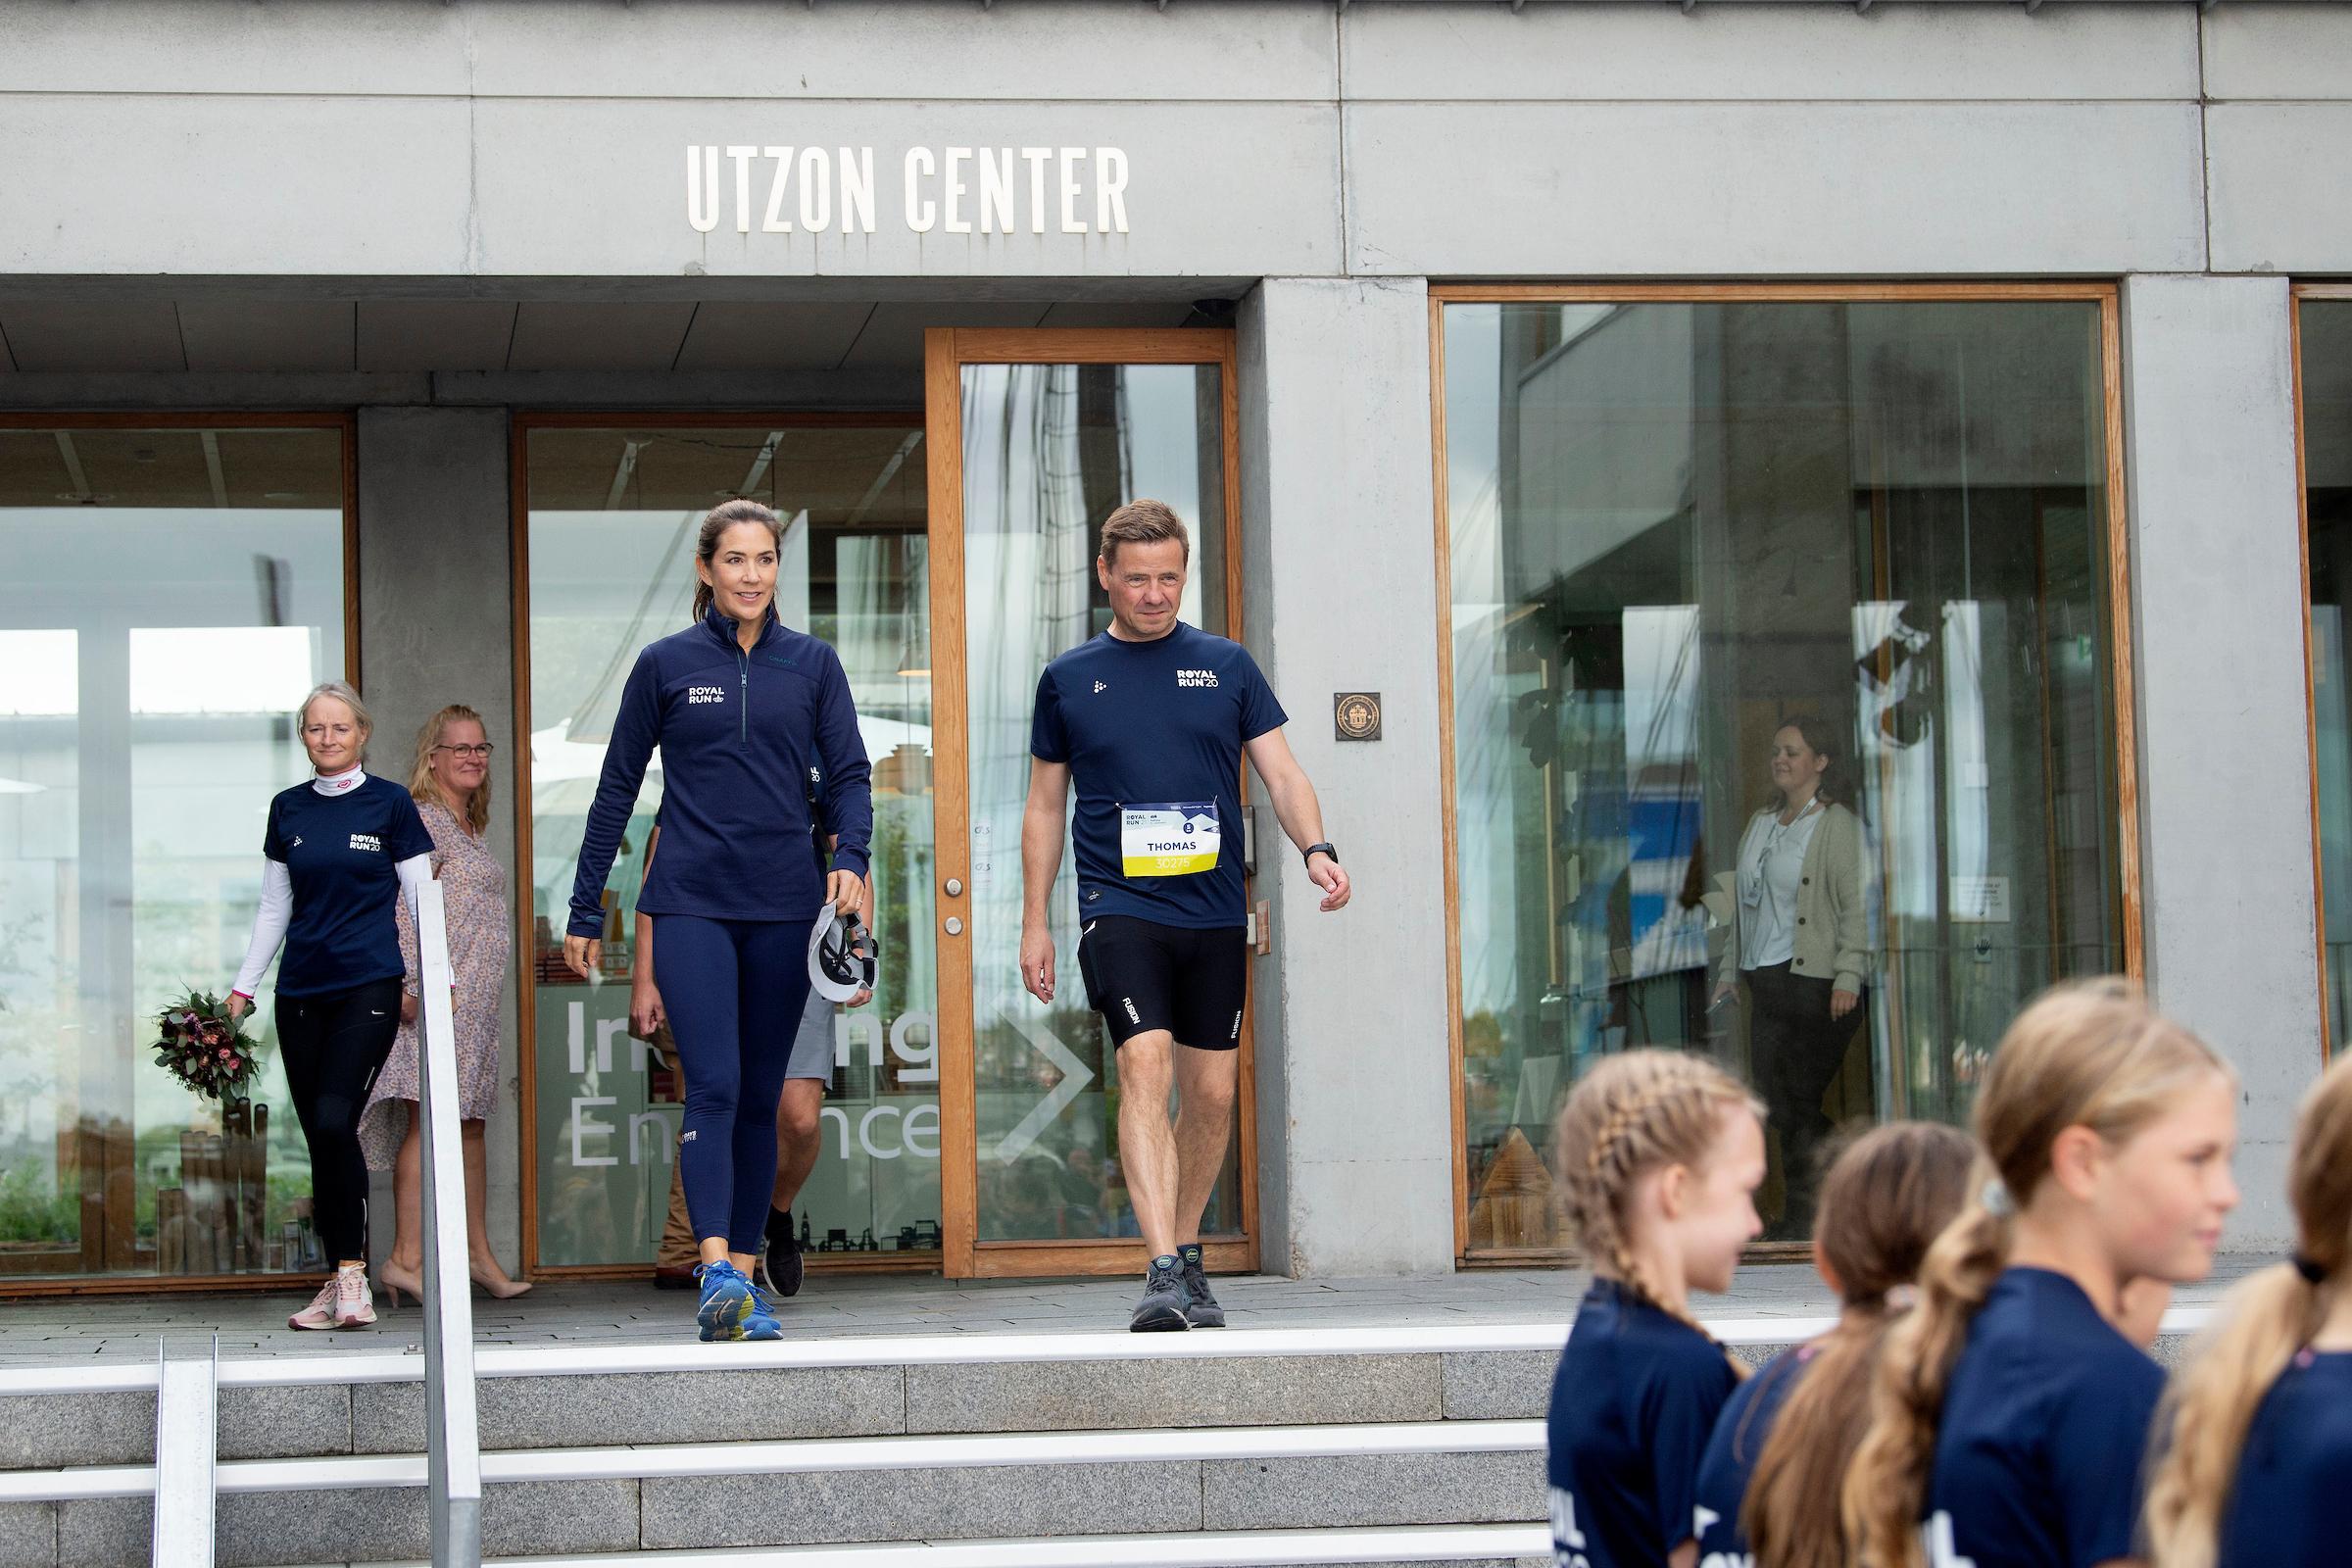 Se billederne: Kronprinsessen løber Royal Run i Aalborg